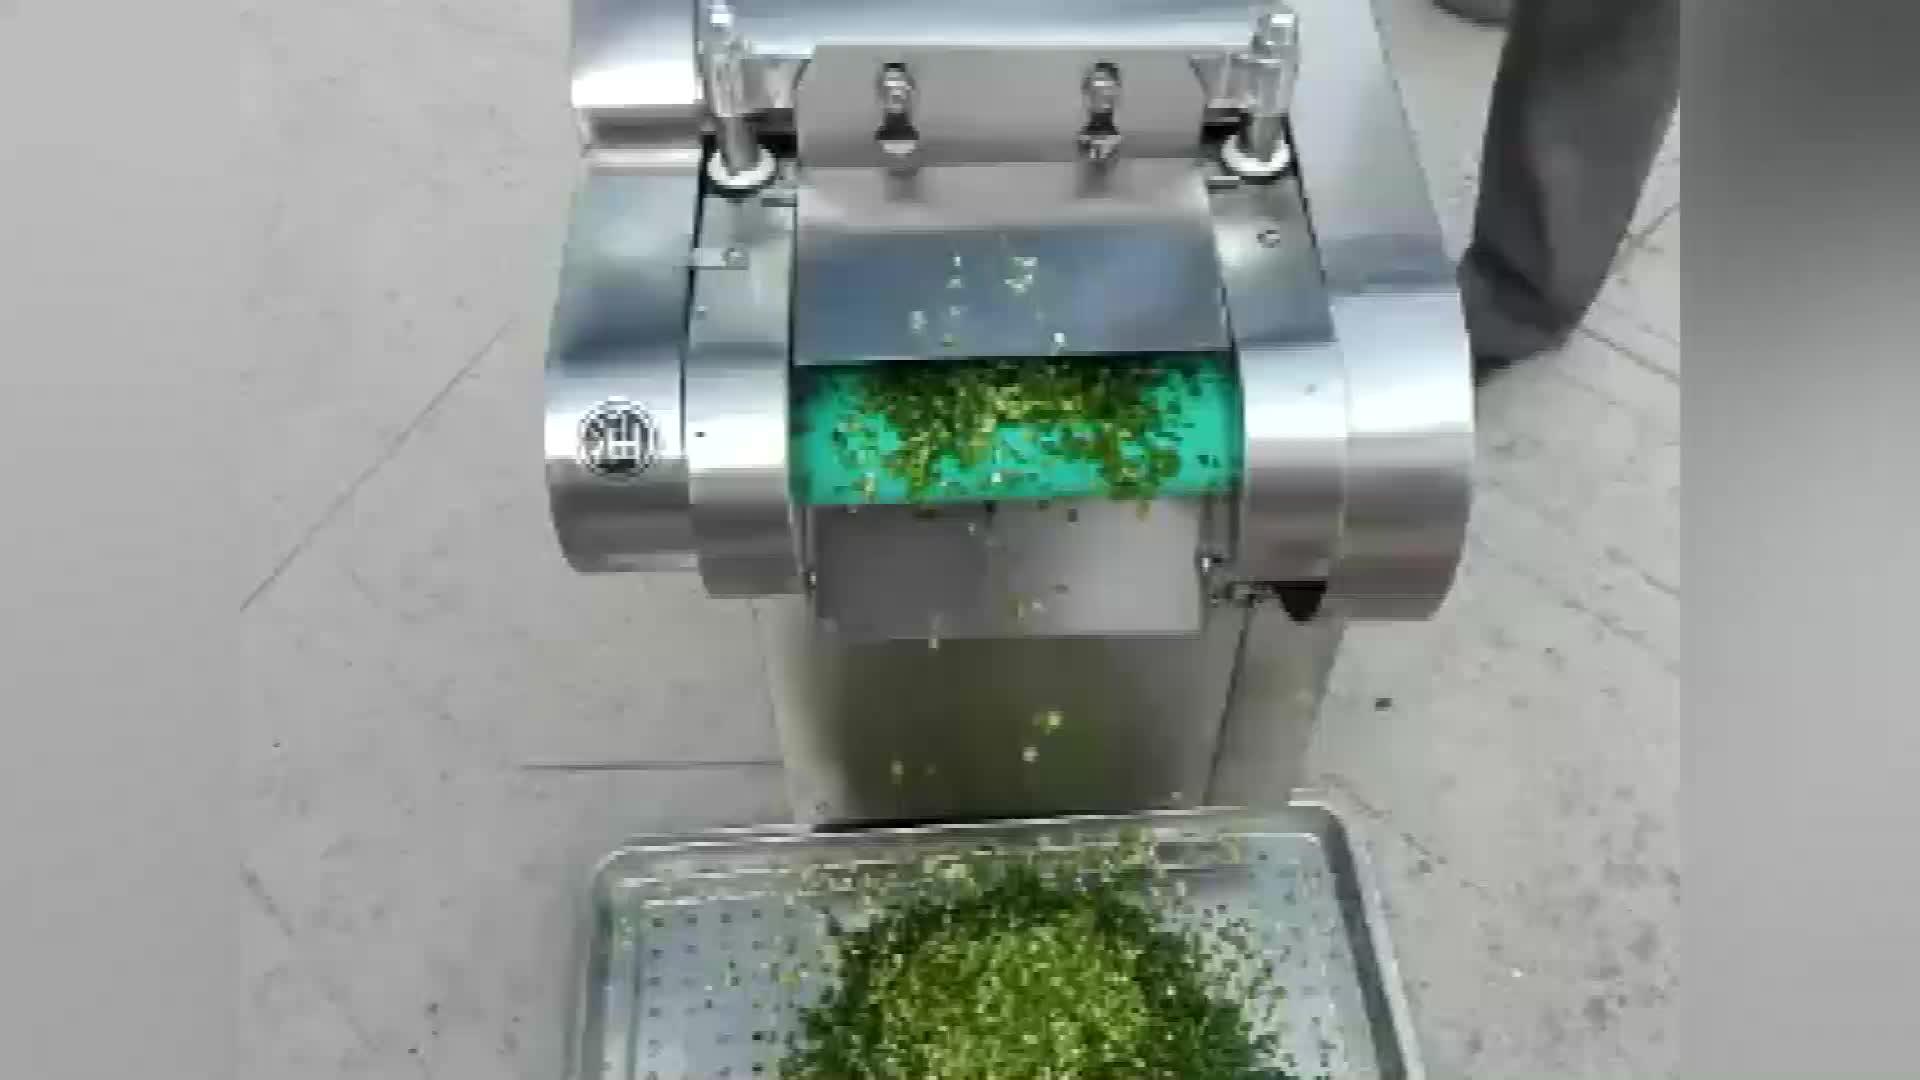 5 En 1 cortadora de verduras/chino cortadora de verduras/vegetales helicóptero cortadora